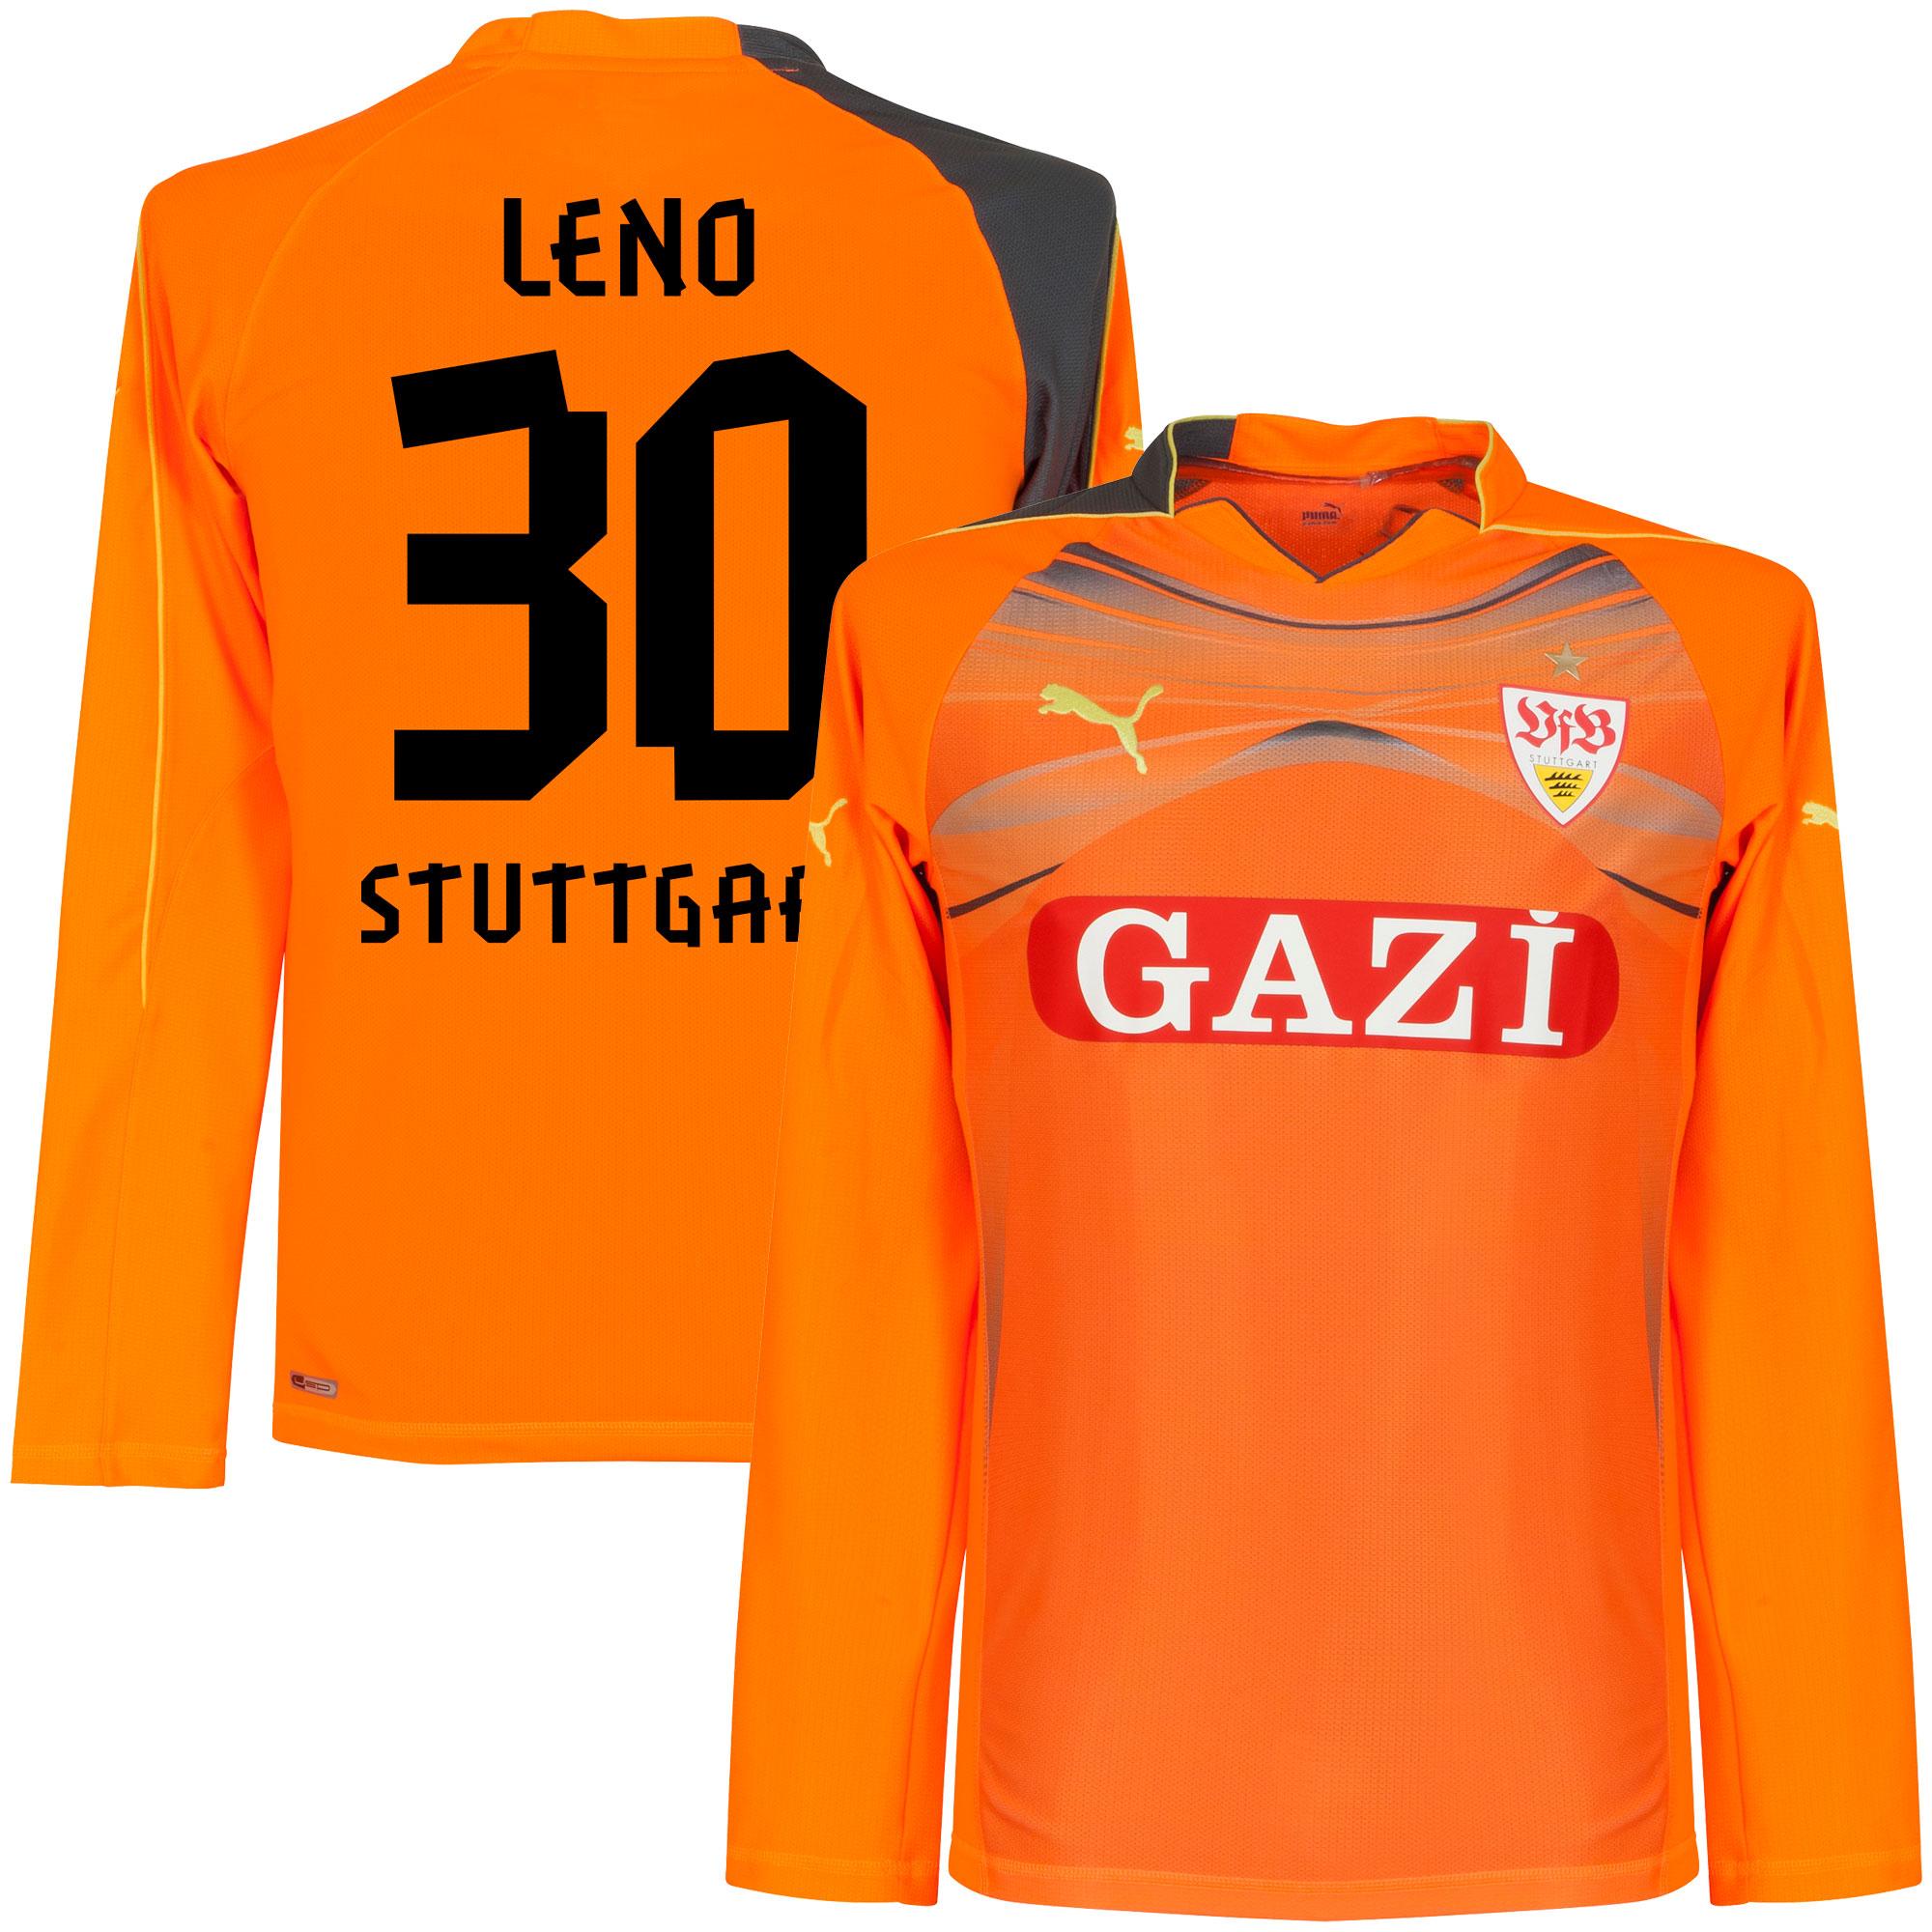 11-12 VfB Stuttgart GK Jersey + Leno 30 (Fan Style Printing) - XXL